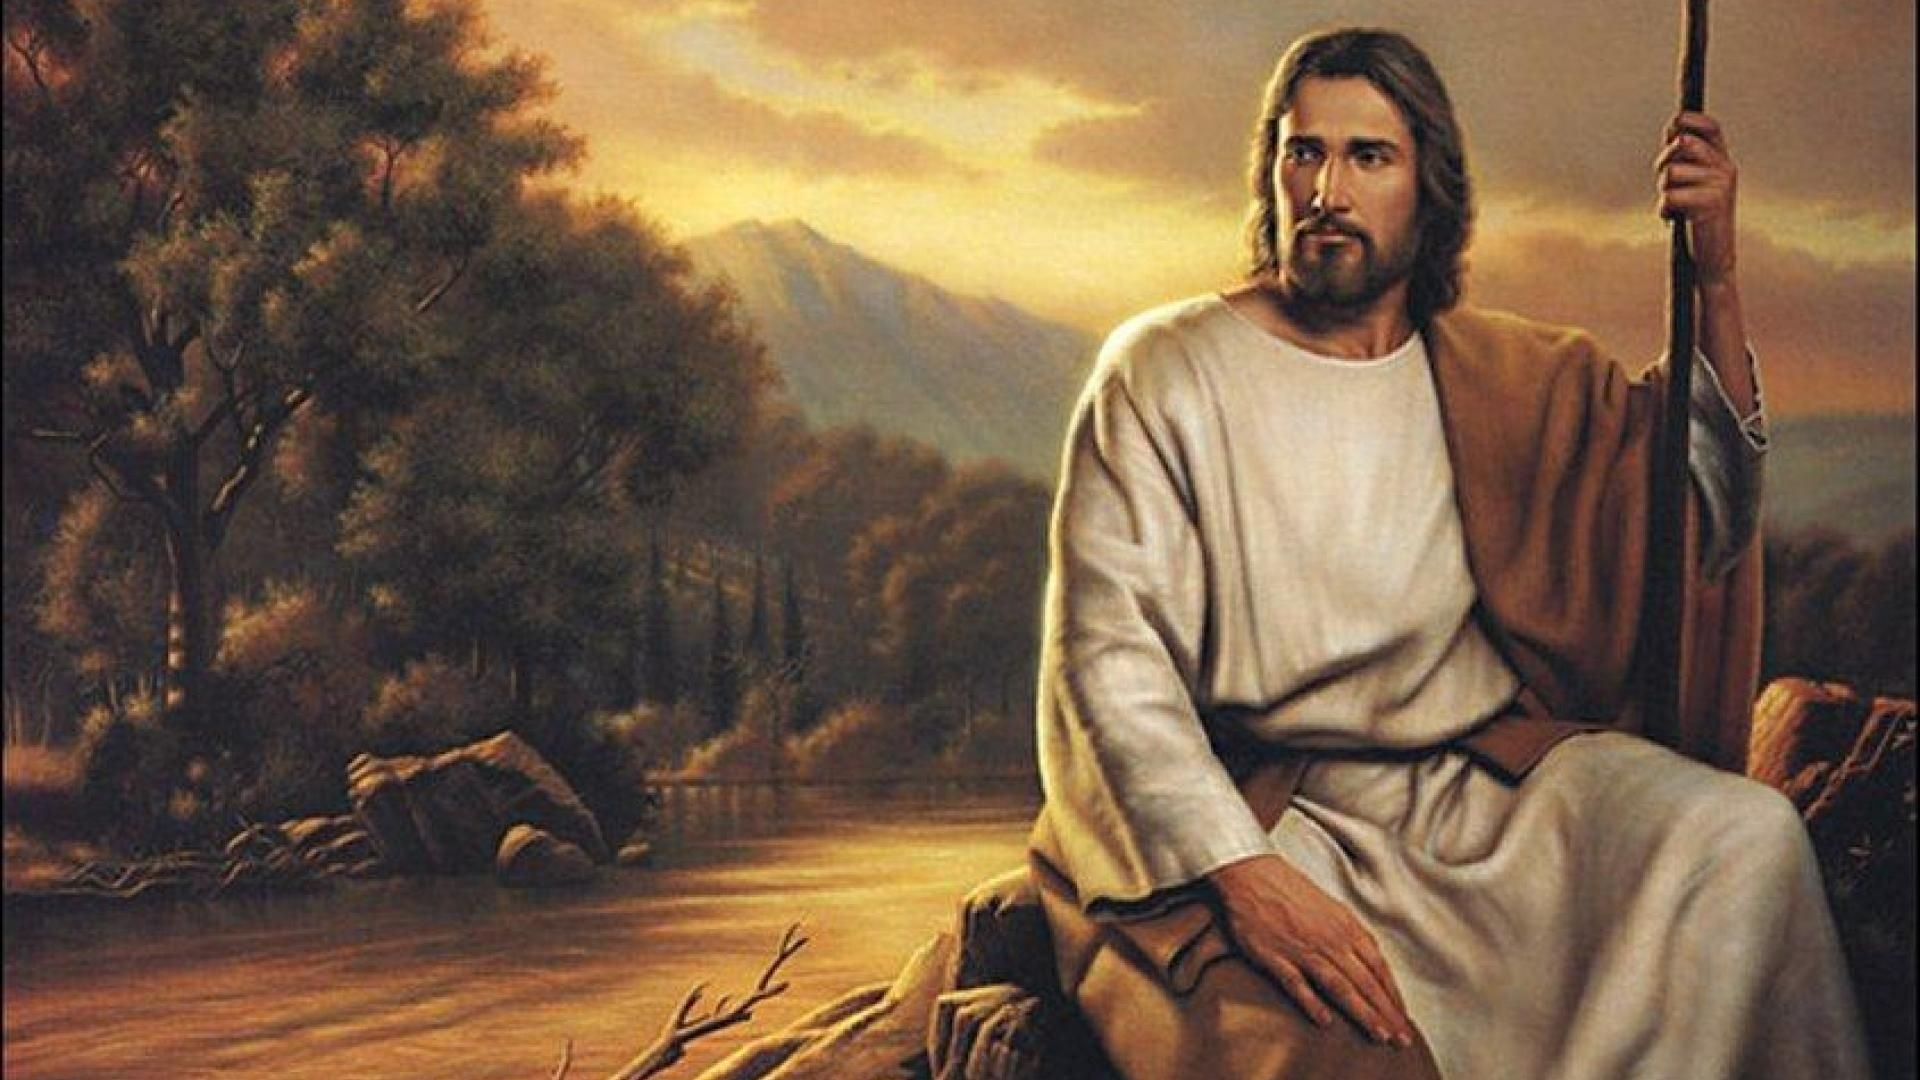 10 Most Popular Jesus Wallpaper Hd Widescreen FULL HD 1920x1080 For PC Desktop